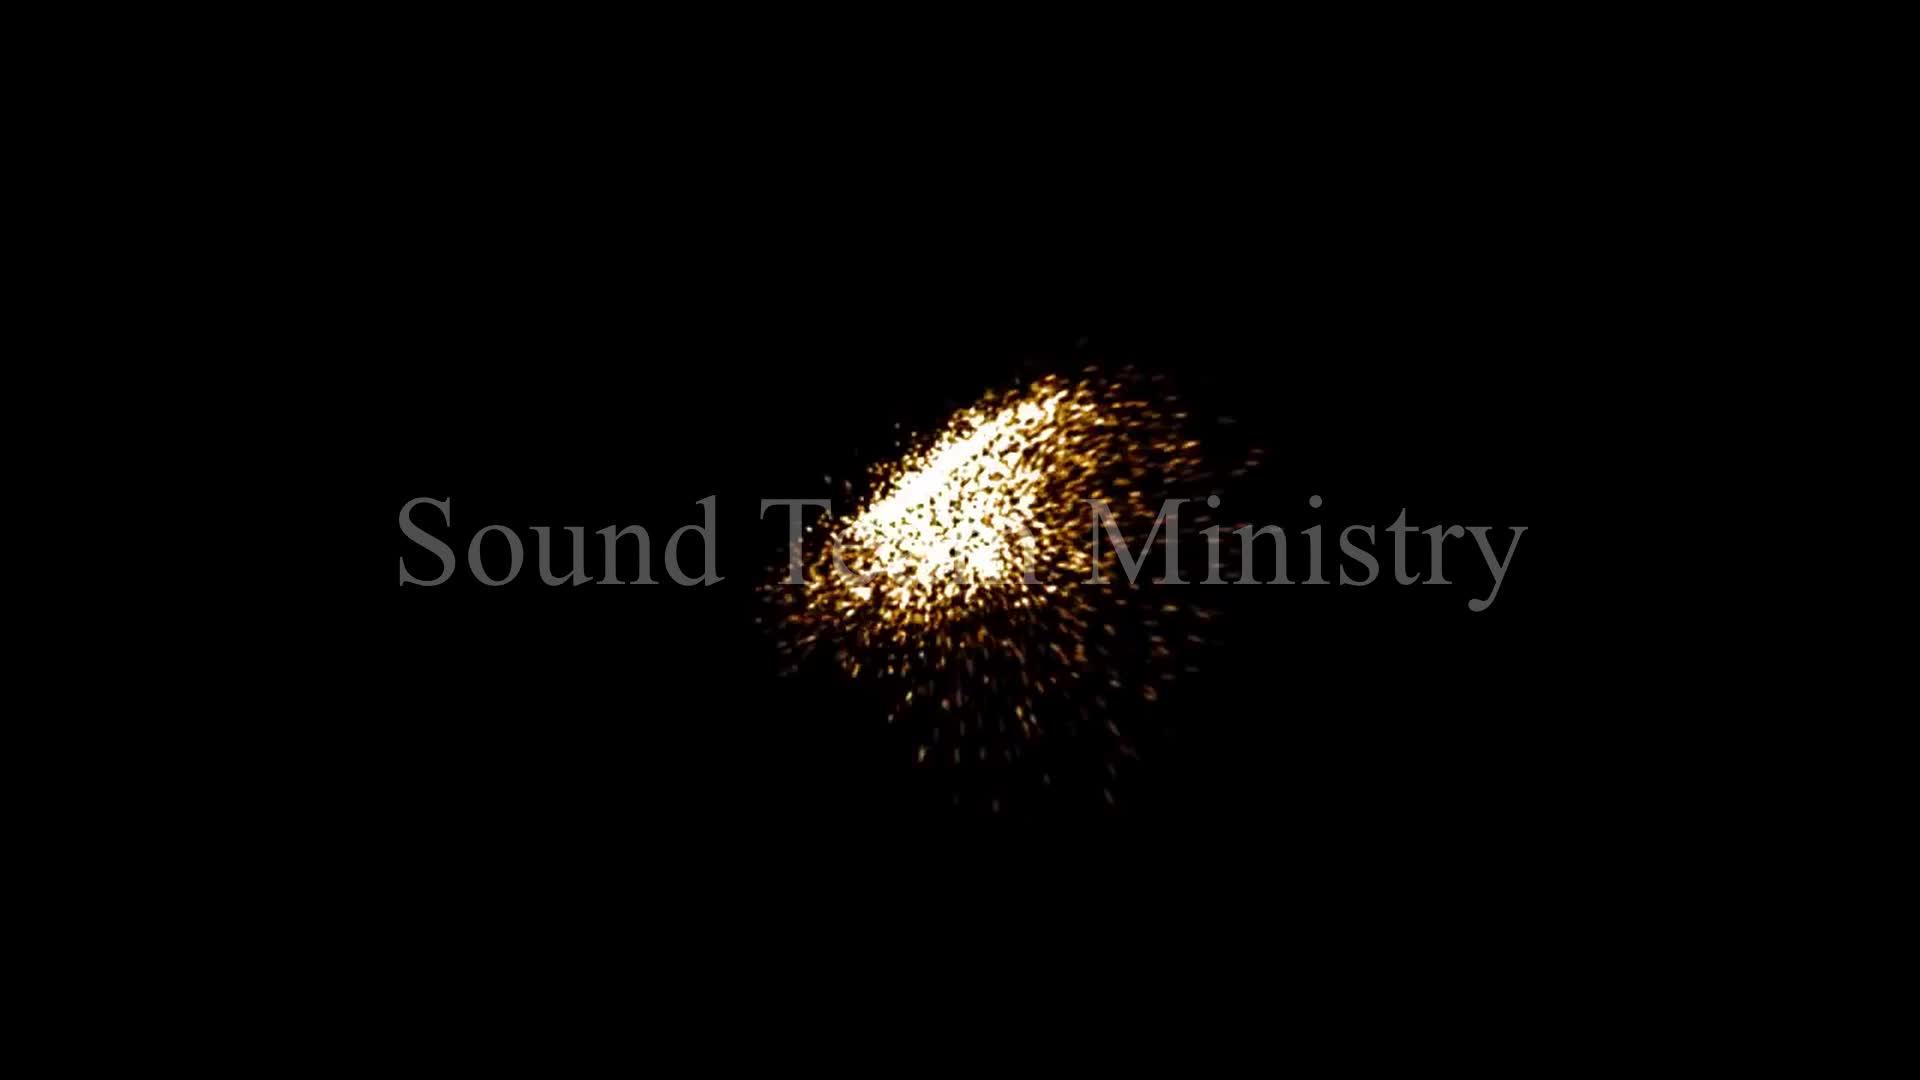 Sound Team Ministry